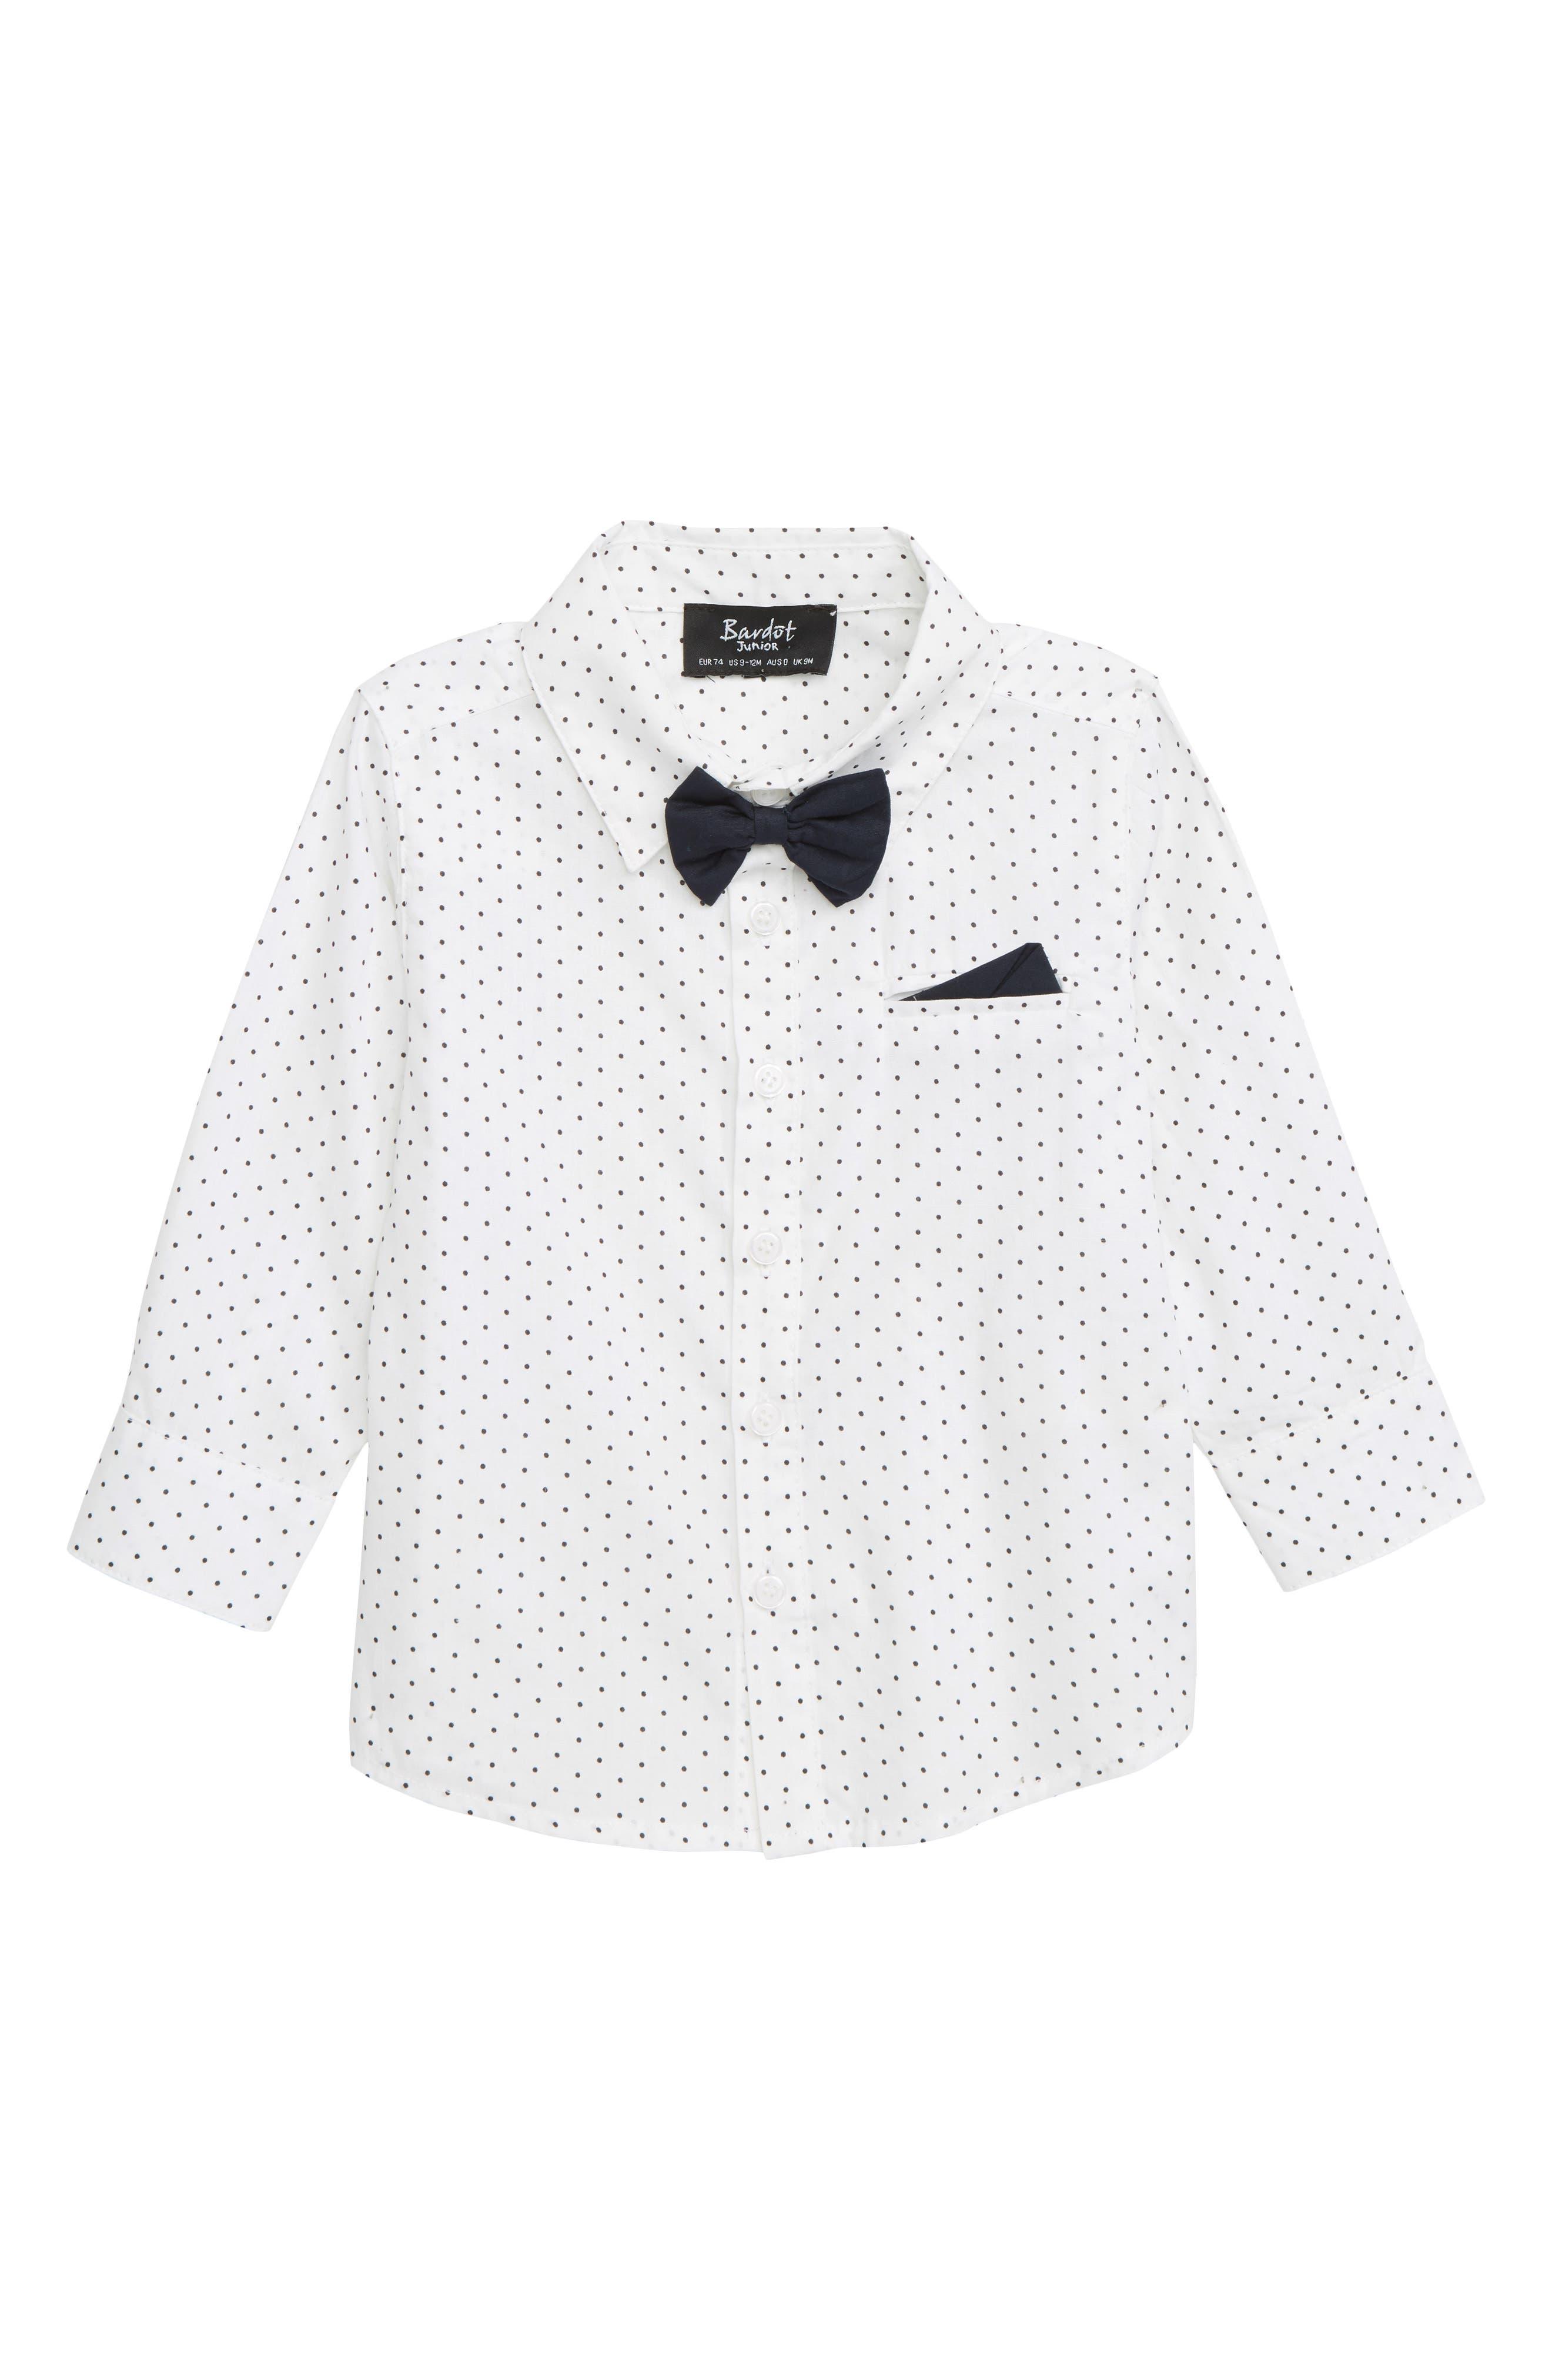 BARDOT JUNIOR Dobby Shirt, Main, color, 100